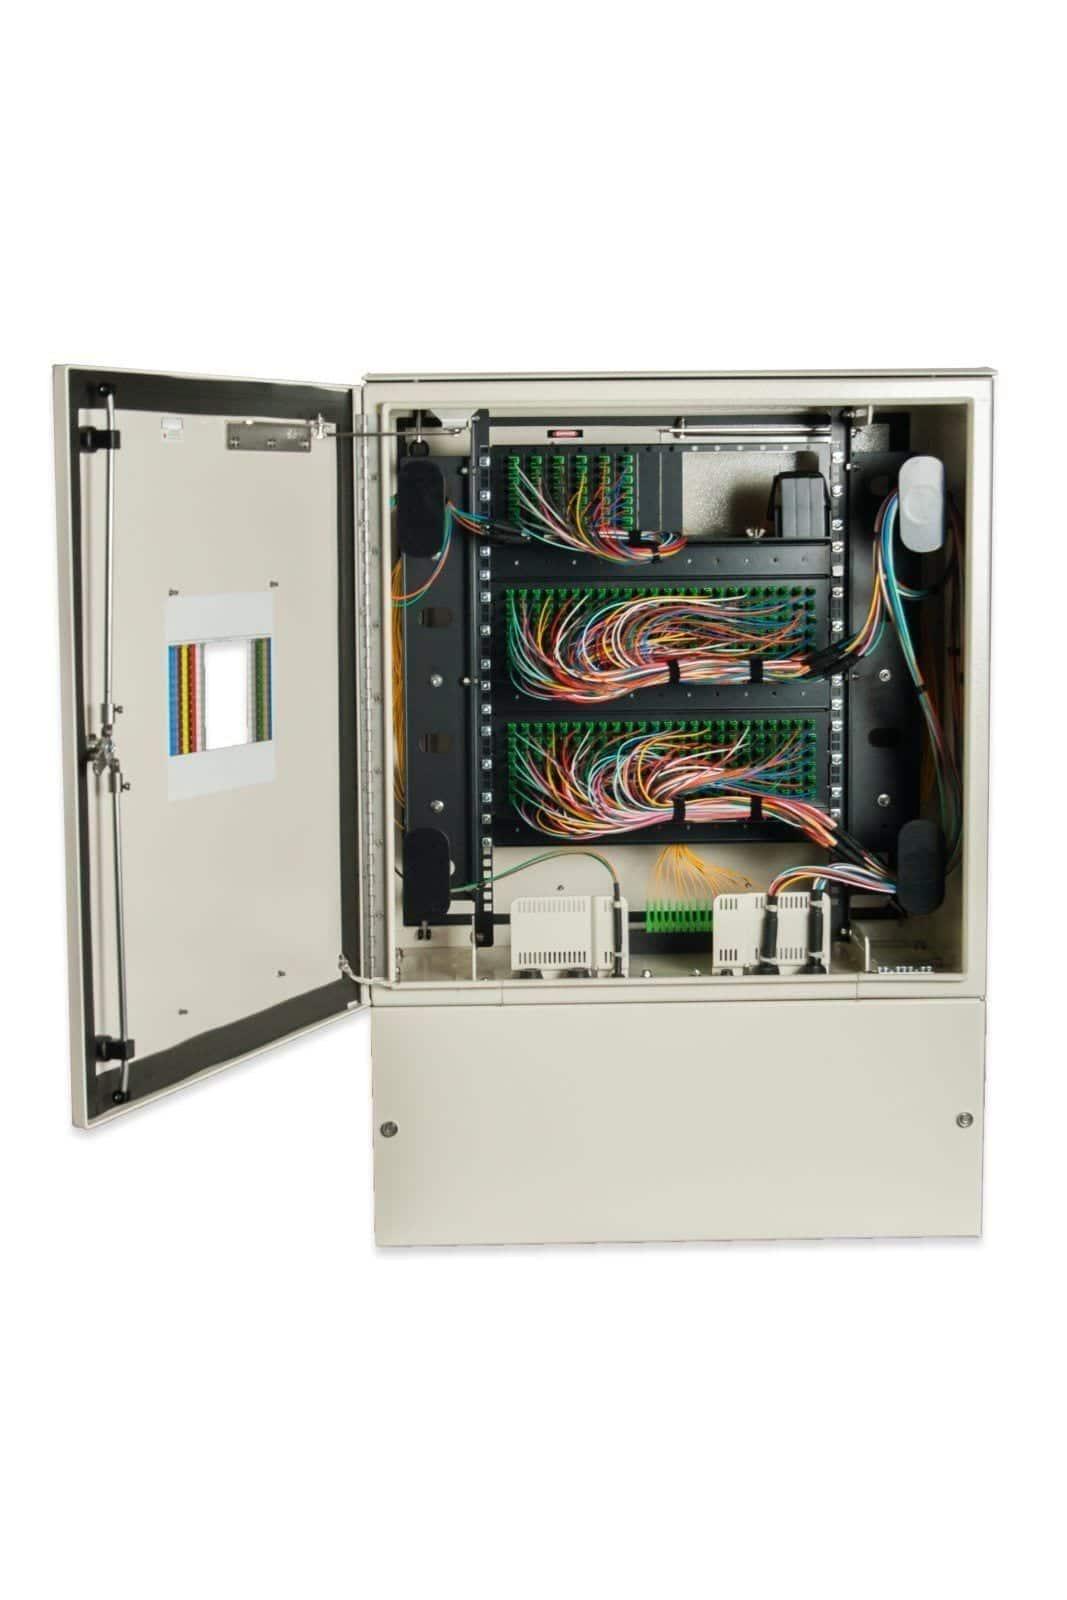 hight resolution of 3 5mm 4p audio plug wiring a 3 way plug wiring wiring xlr microphone wiring diagram shure mini xlr wiring diagram